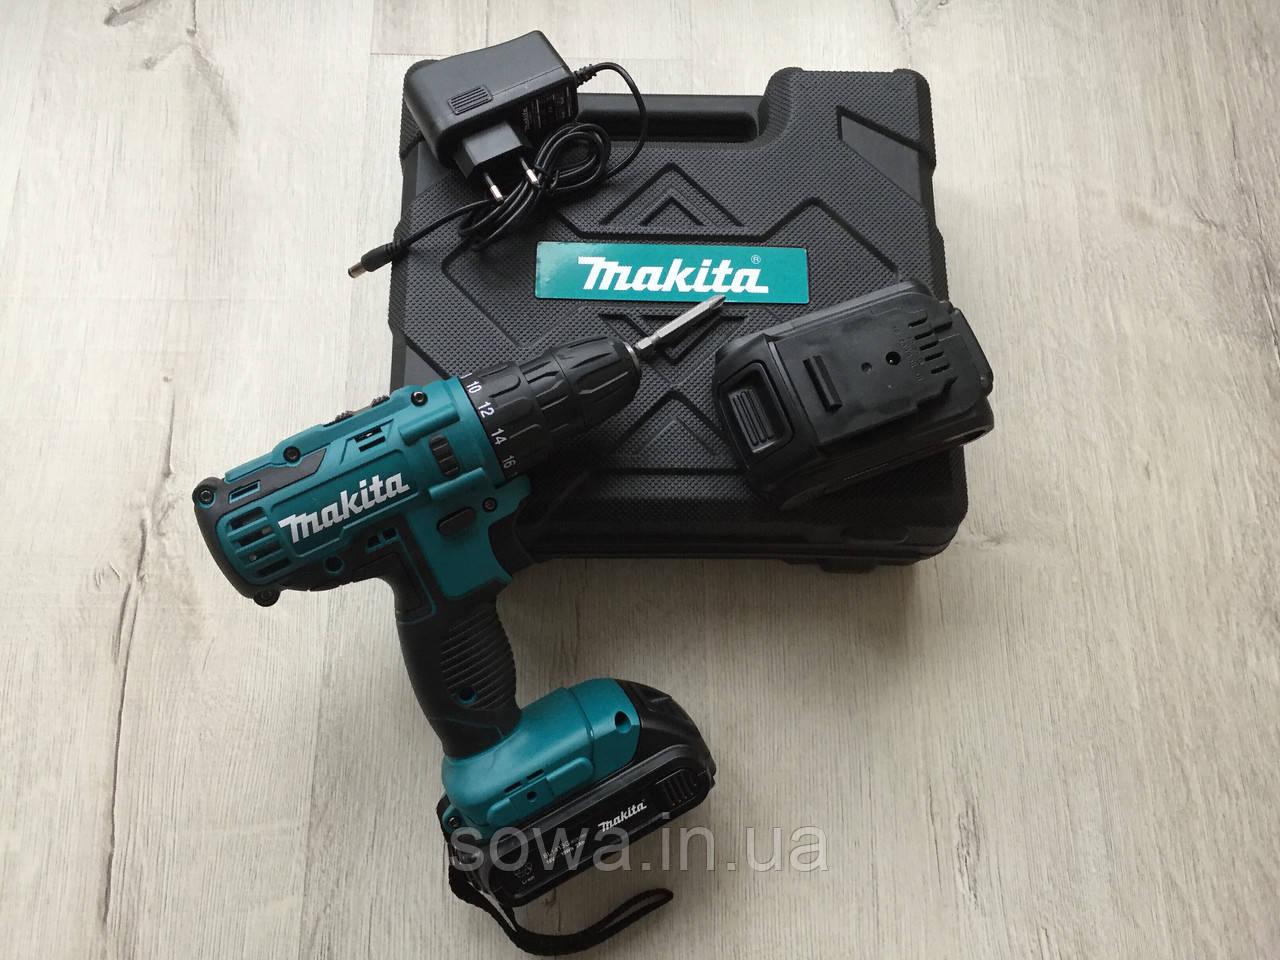 ✔️ Шуруповерт аккумуляторный Makita DF332D | 18V | в кейсе